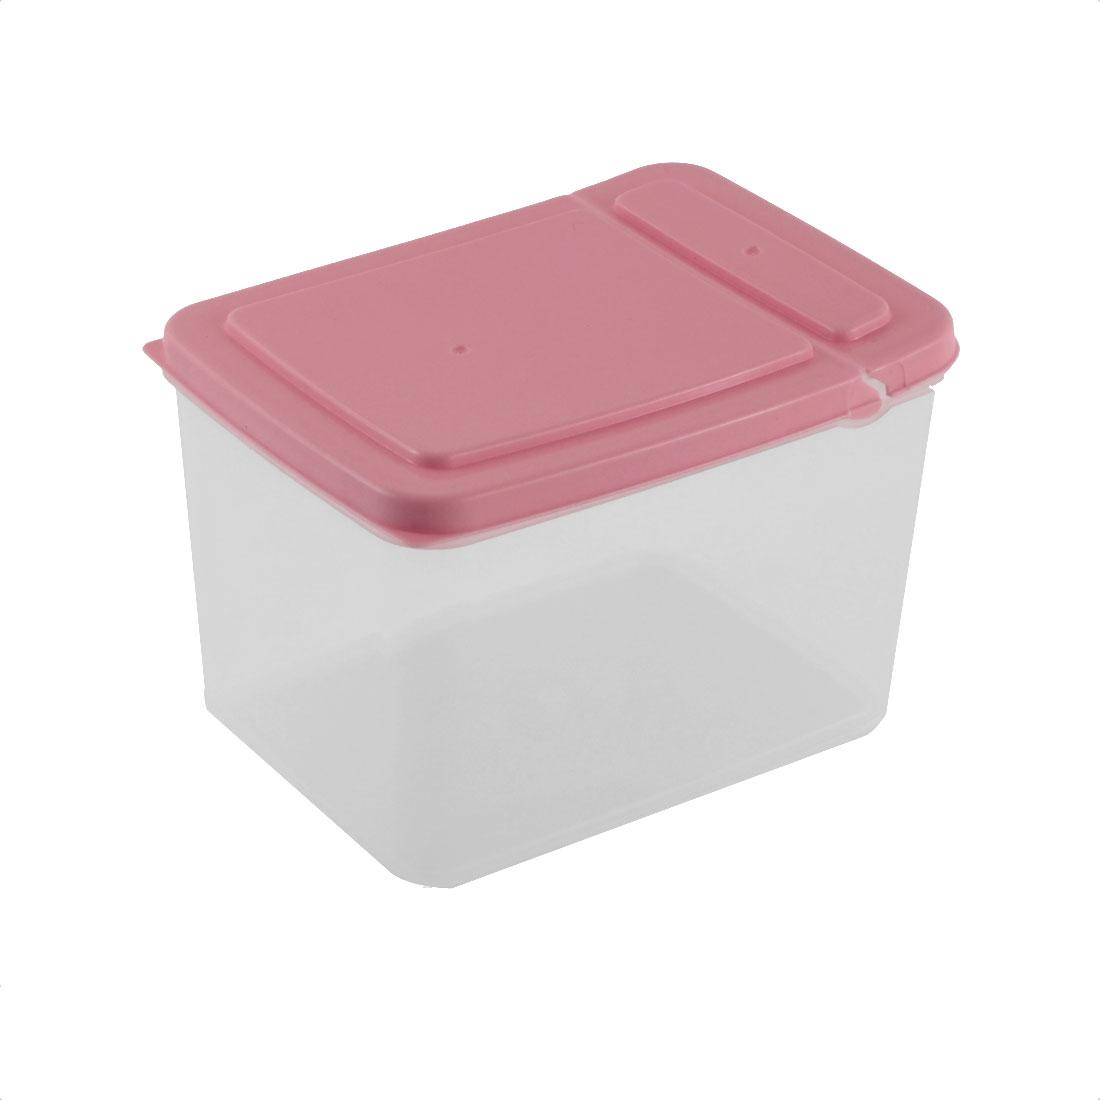 Household Pantry Refrigerator Freezer Plastic Transparent Storage Box Keeper Pink